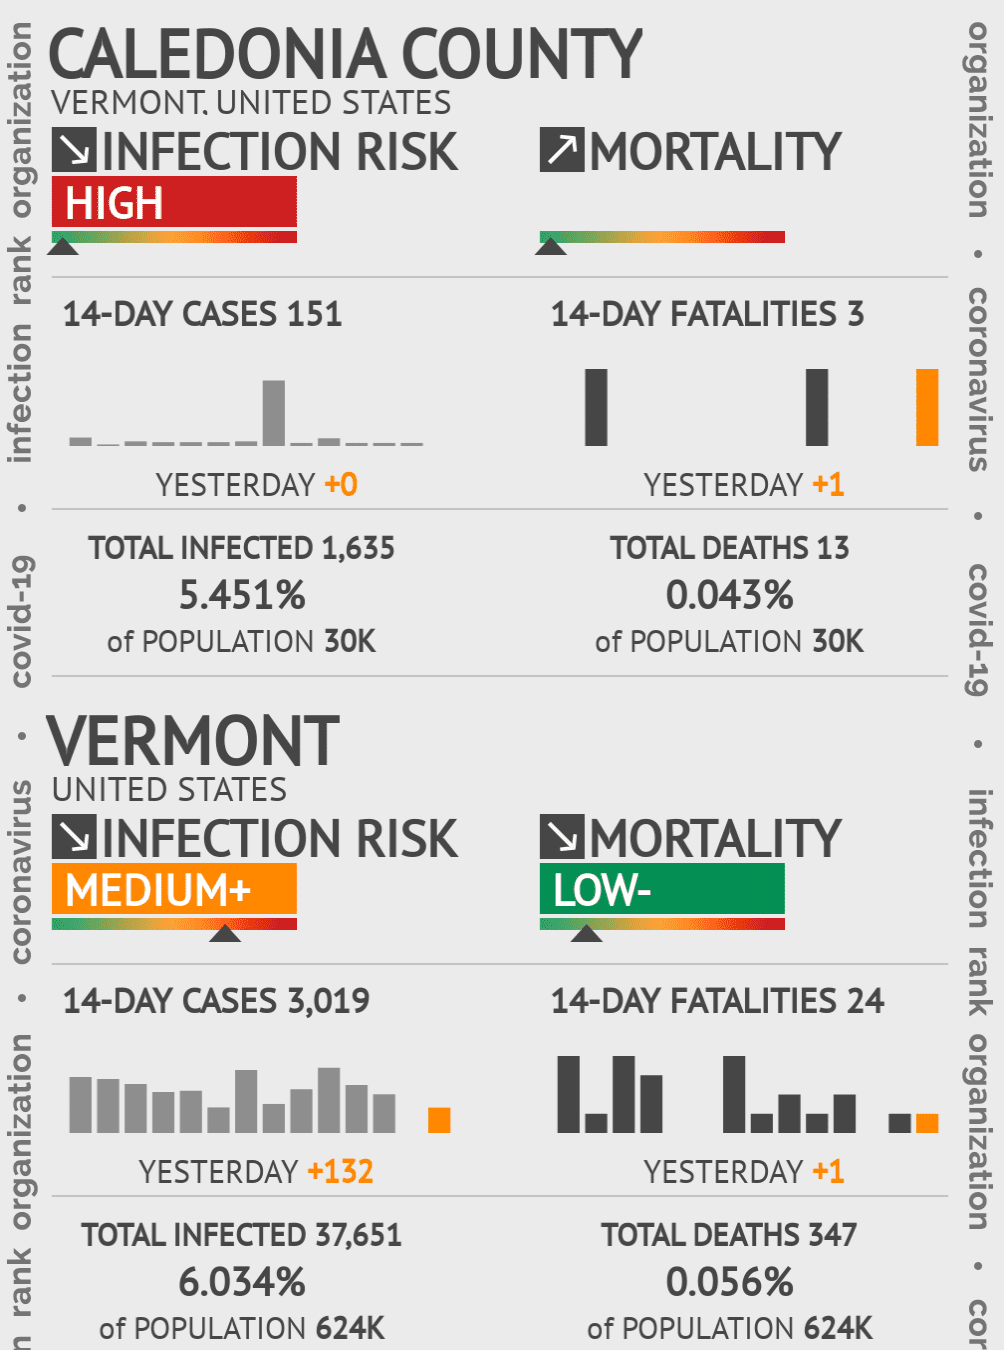 Caledonia County Coronavirus Covid-19 Risk of Infection on July 24, 2021